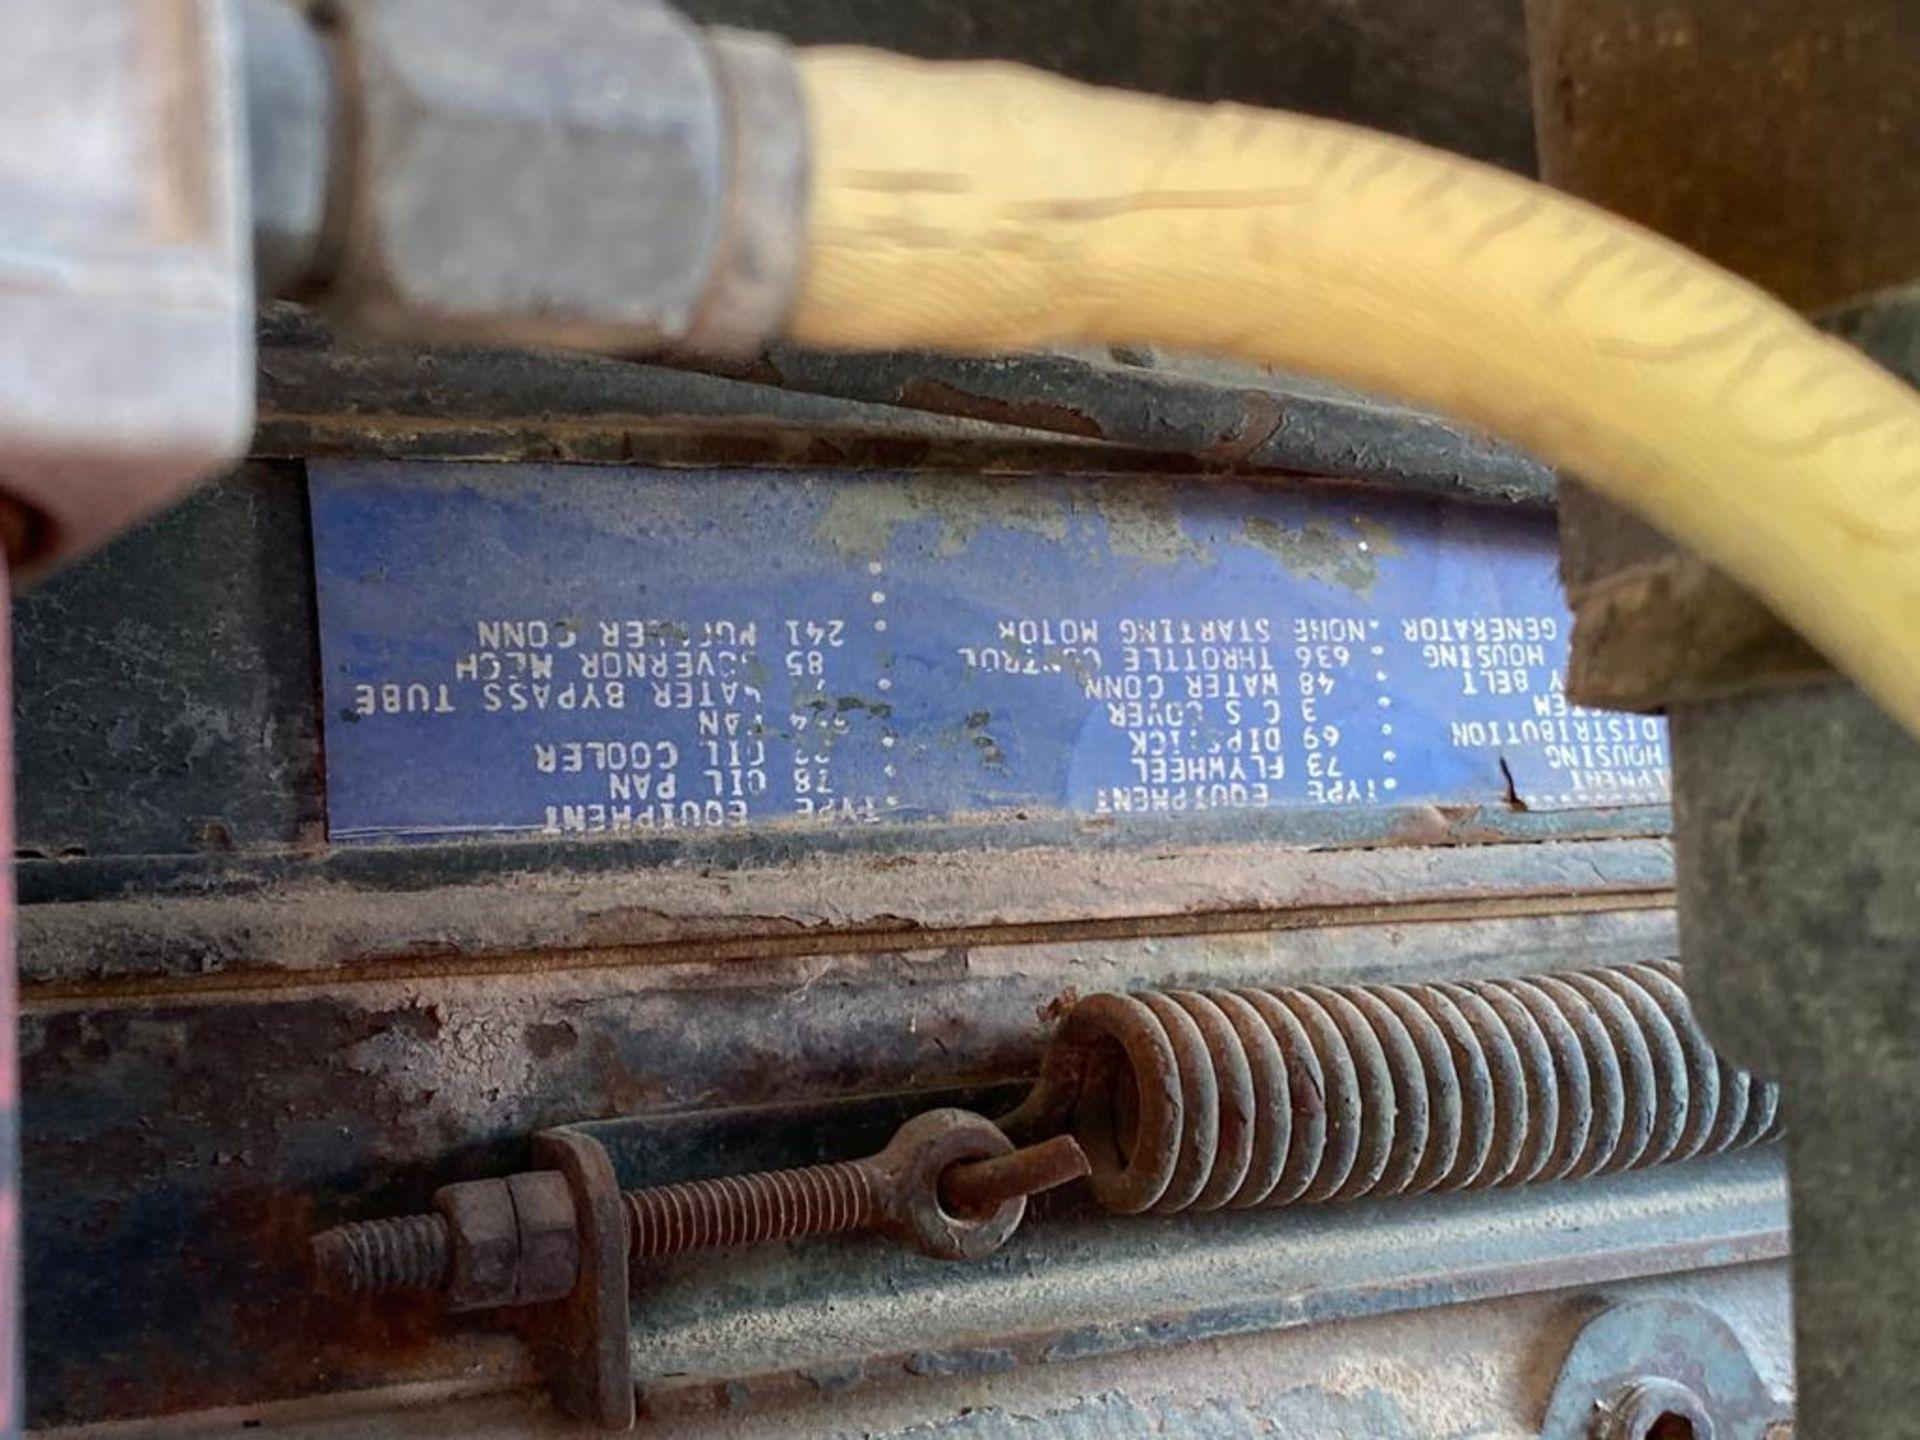 1970 Wabco4 440H Motor Grader, Serial number 440HAGM1398 - Image 72 of 77